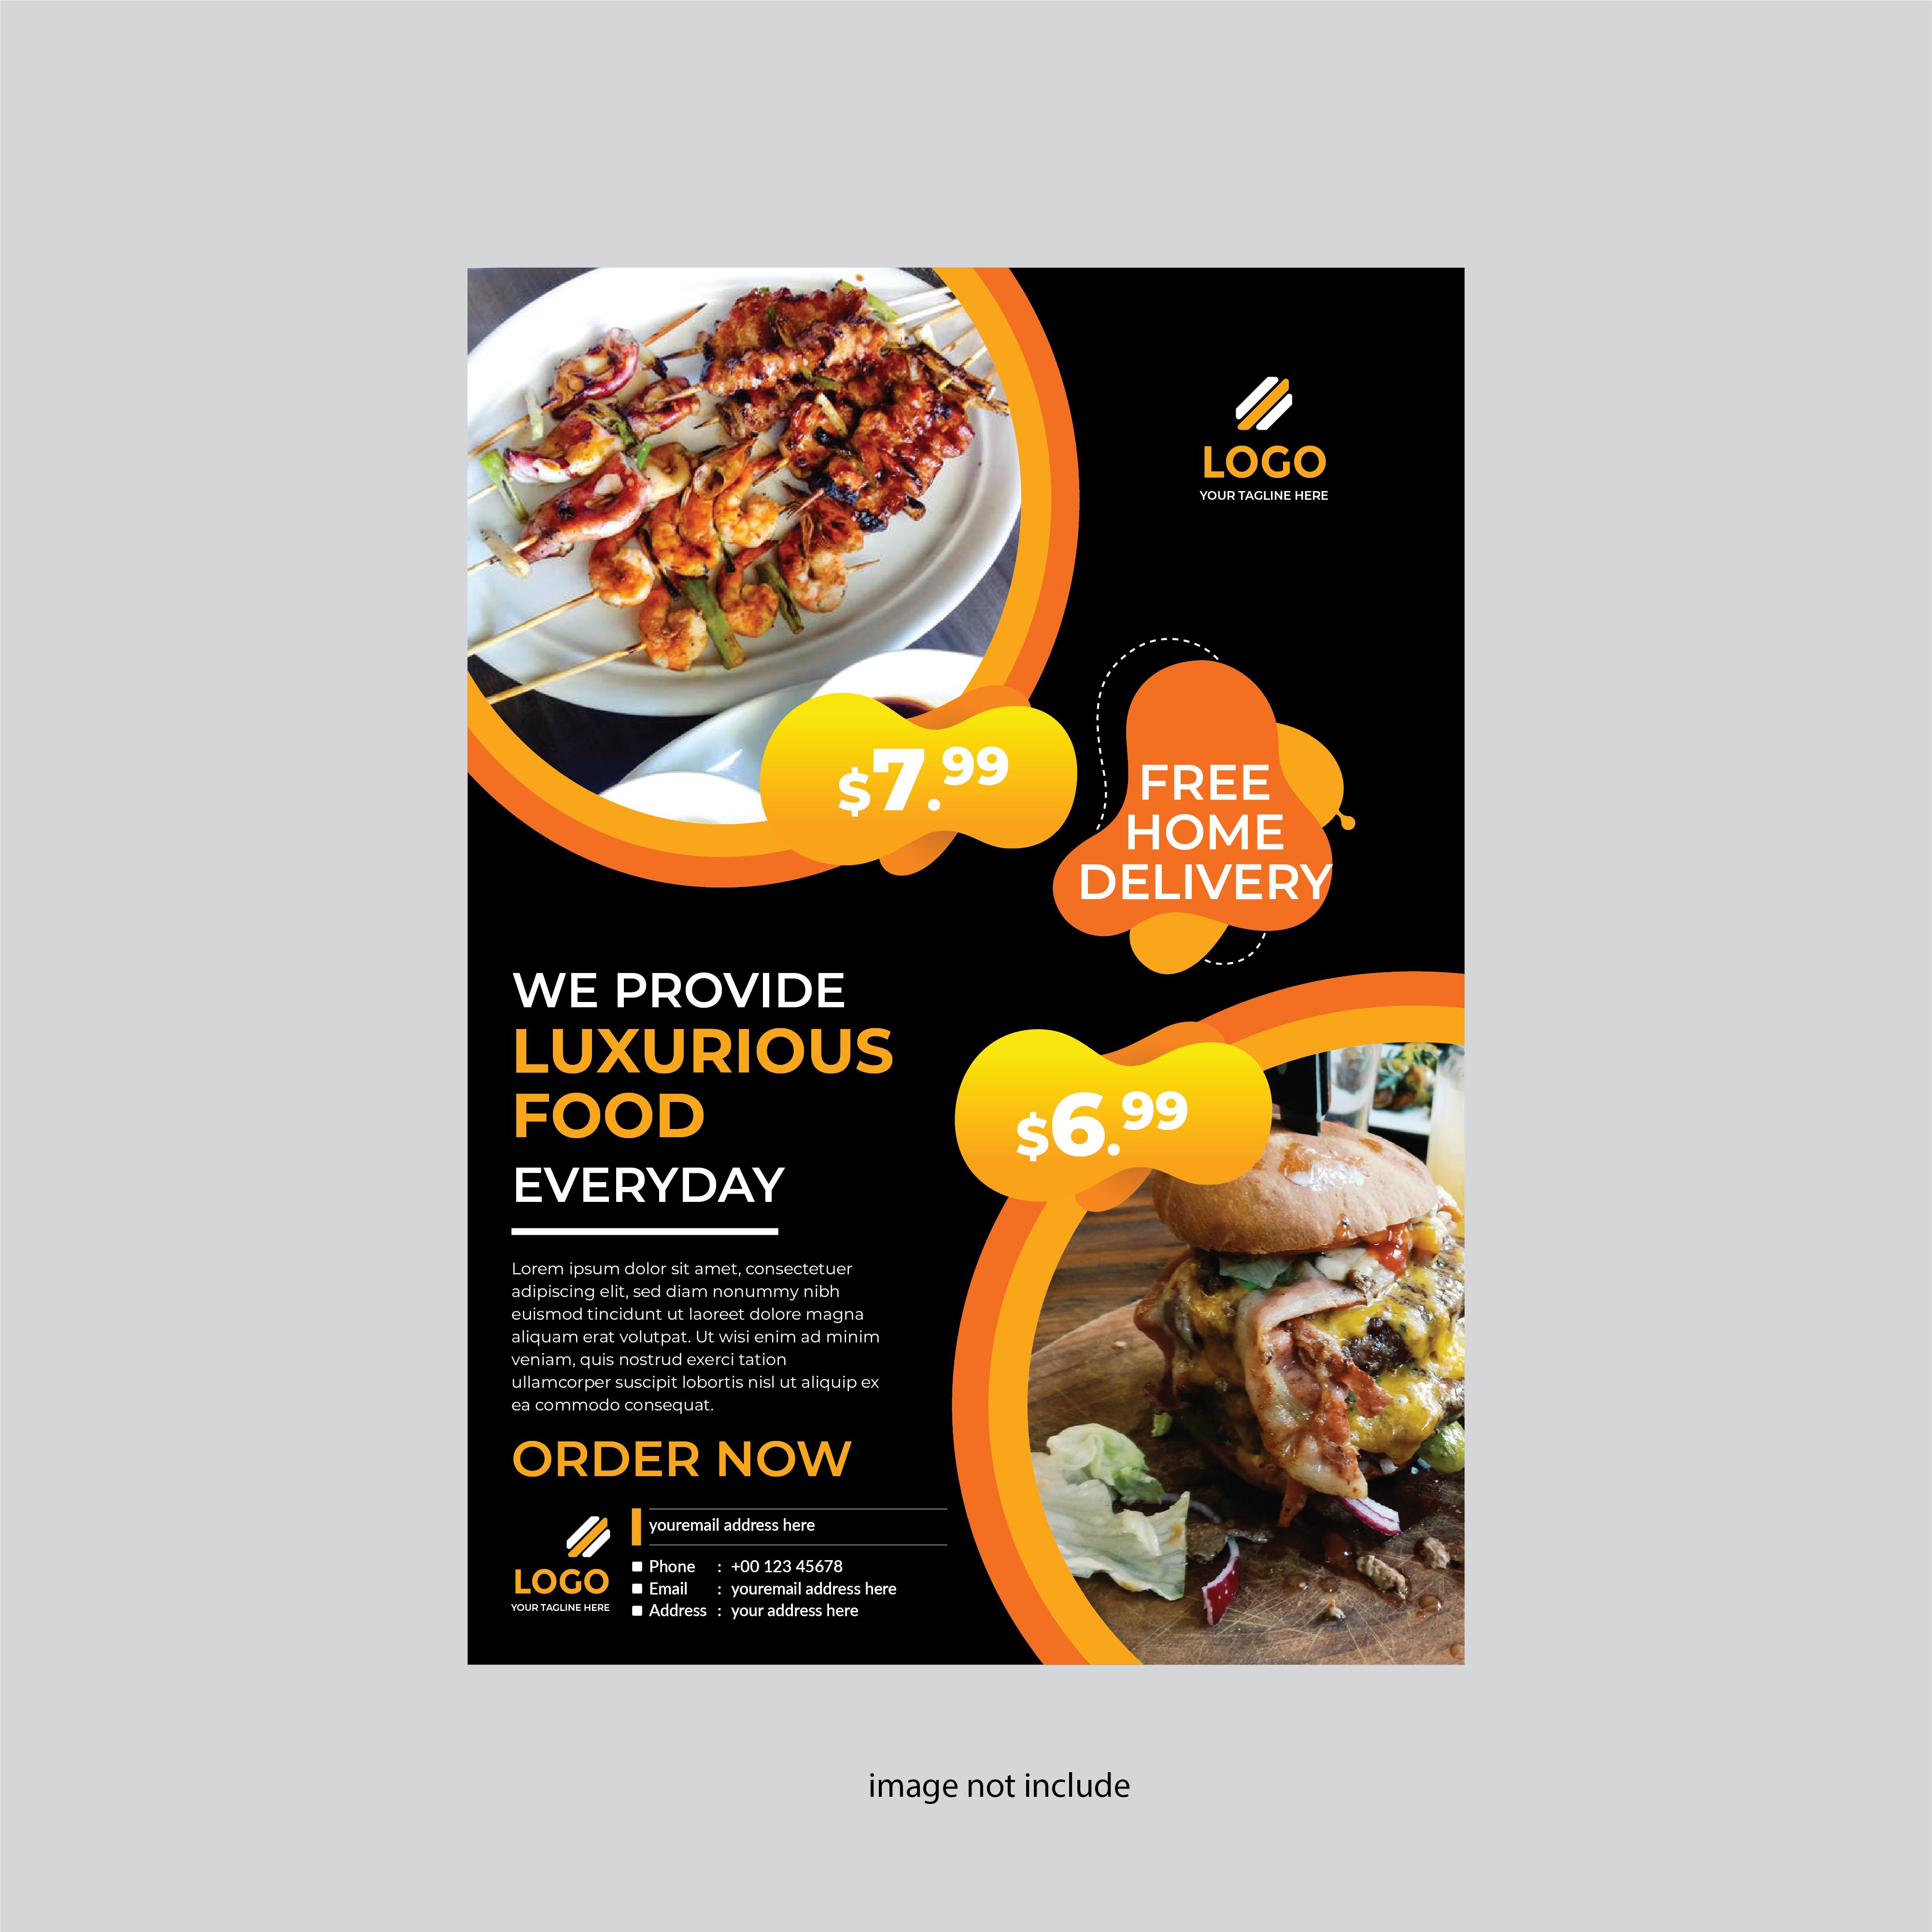 Restaurant Flyer Modern Design Yellow And Black Color Download Free Vectors Clipart Graphics Vector Art